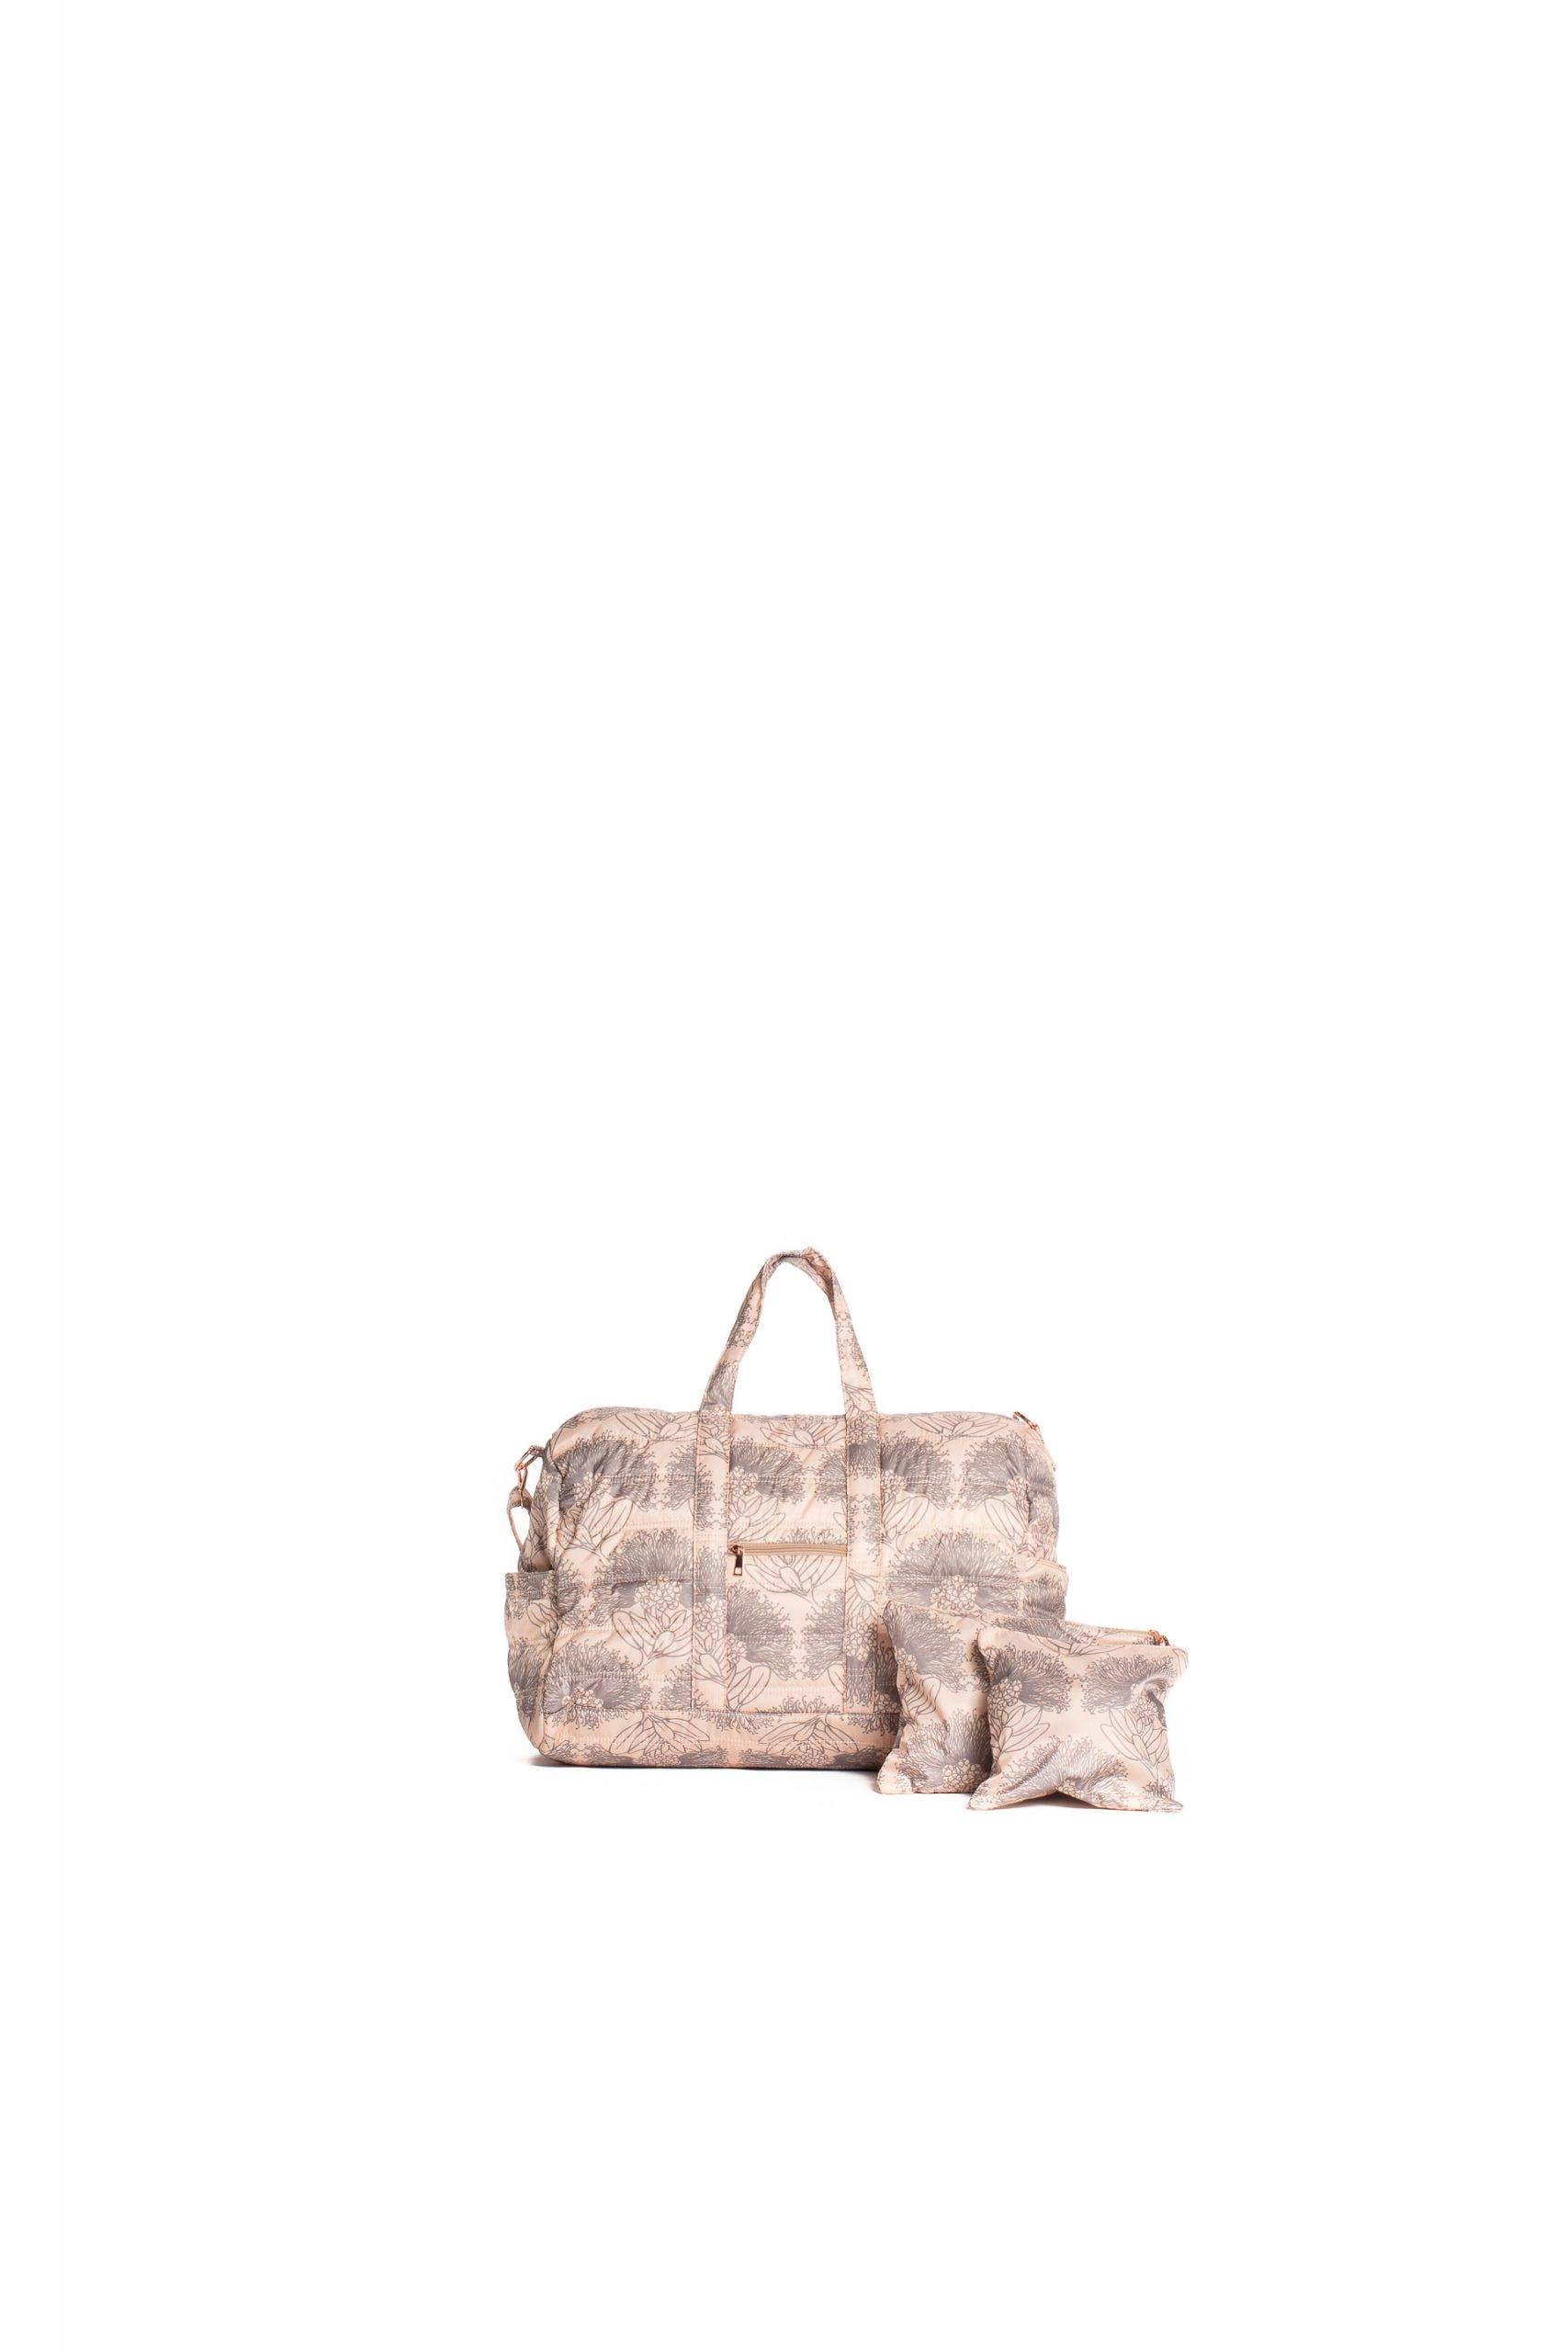 Laulea Bag in Kalihilehua Aprictort/Sherbert